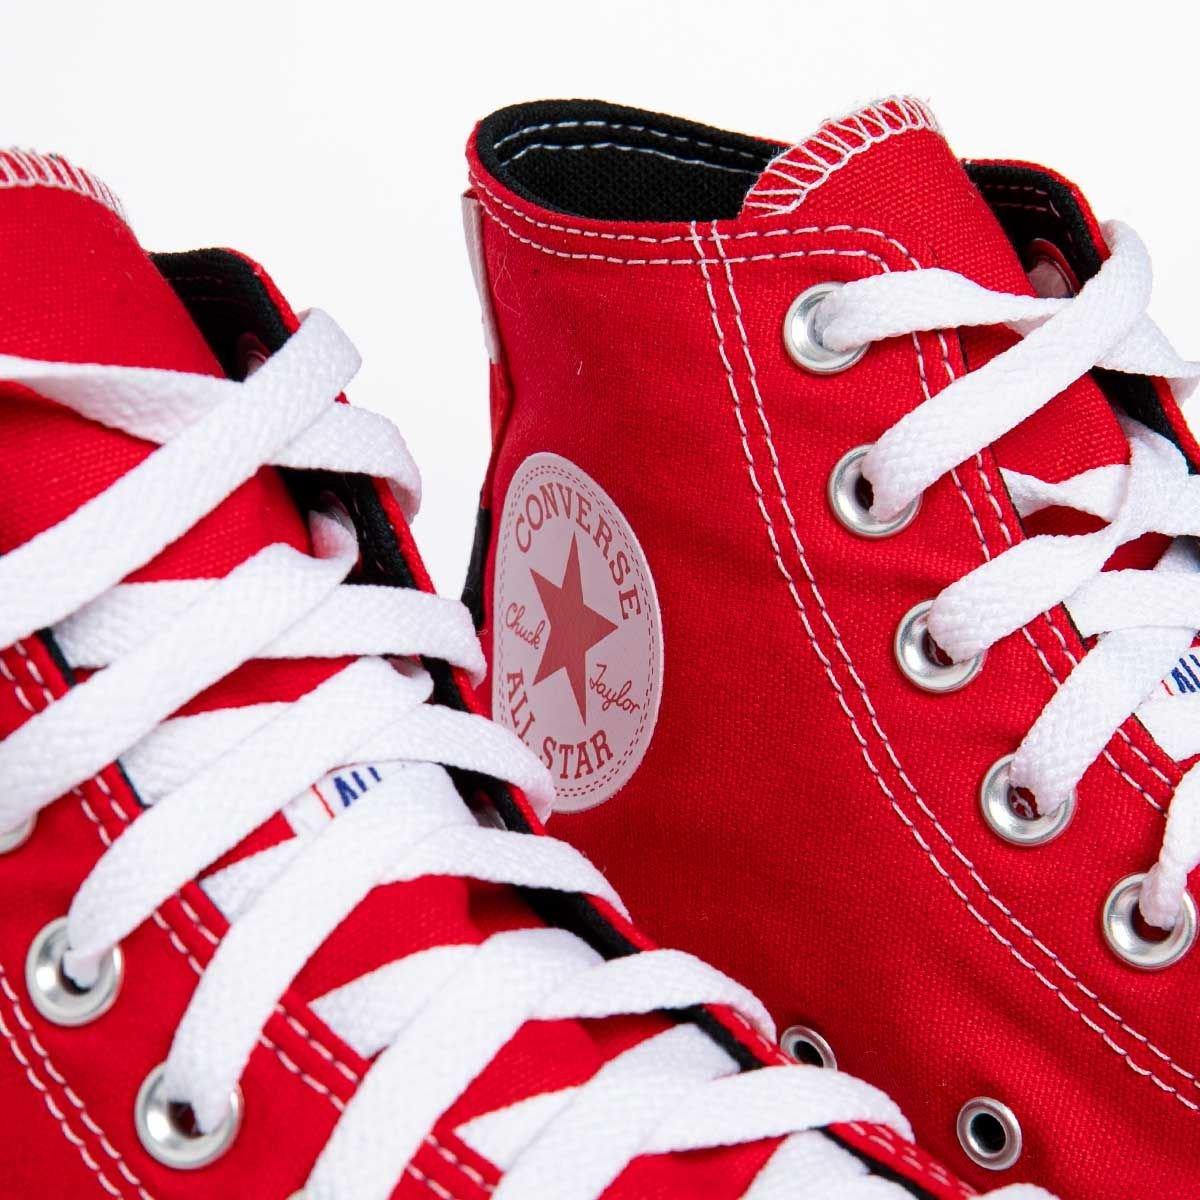 Sneakers buty damskie Converse Chuck Taylor All Star czerwone (167173C)